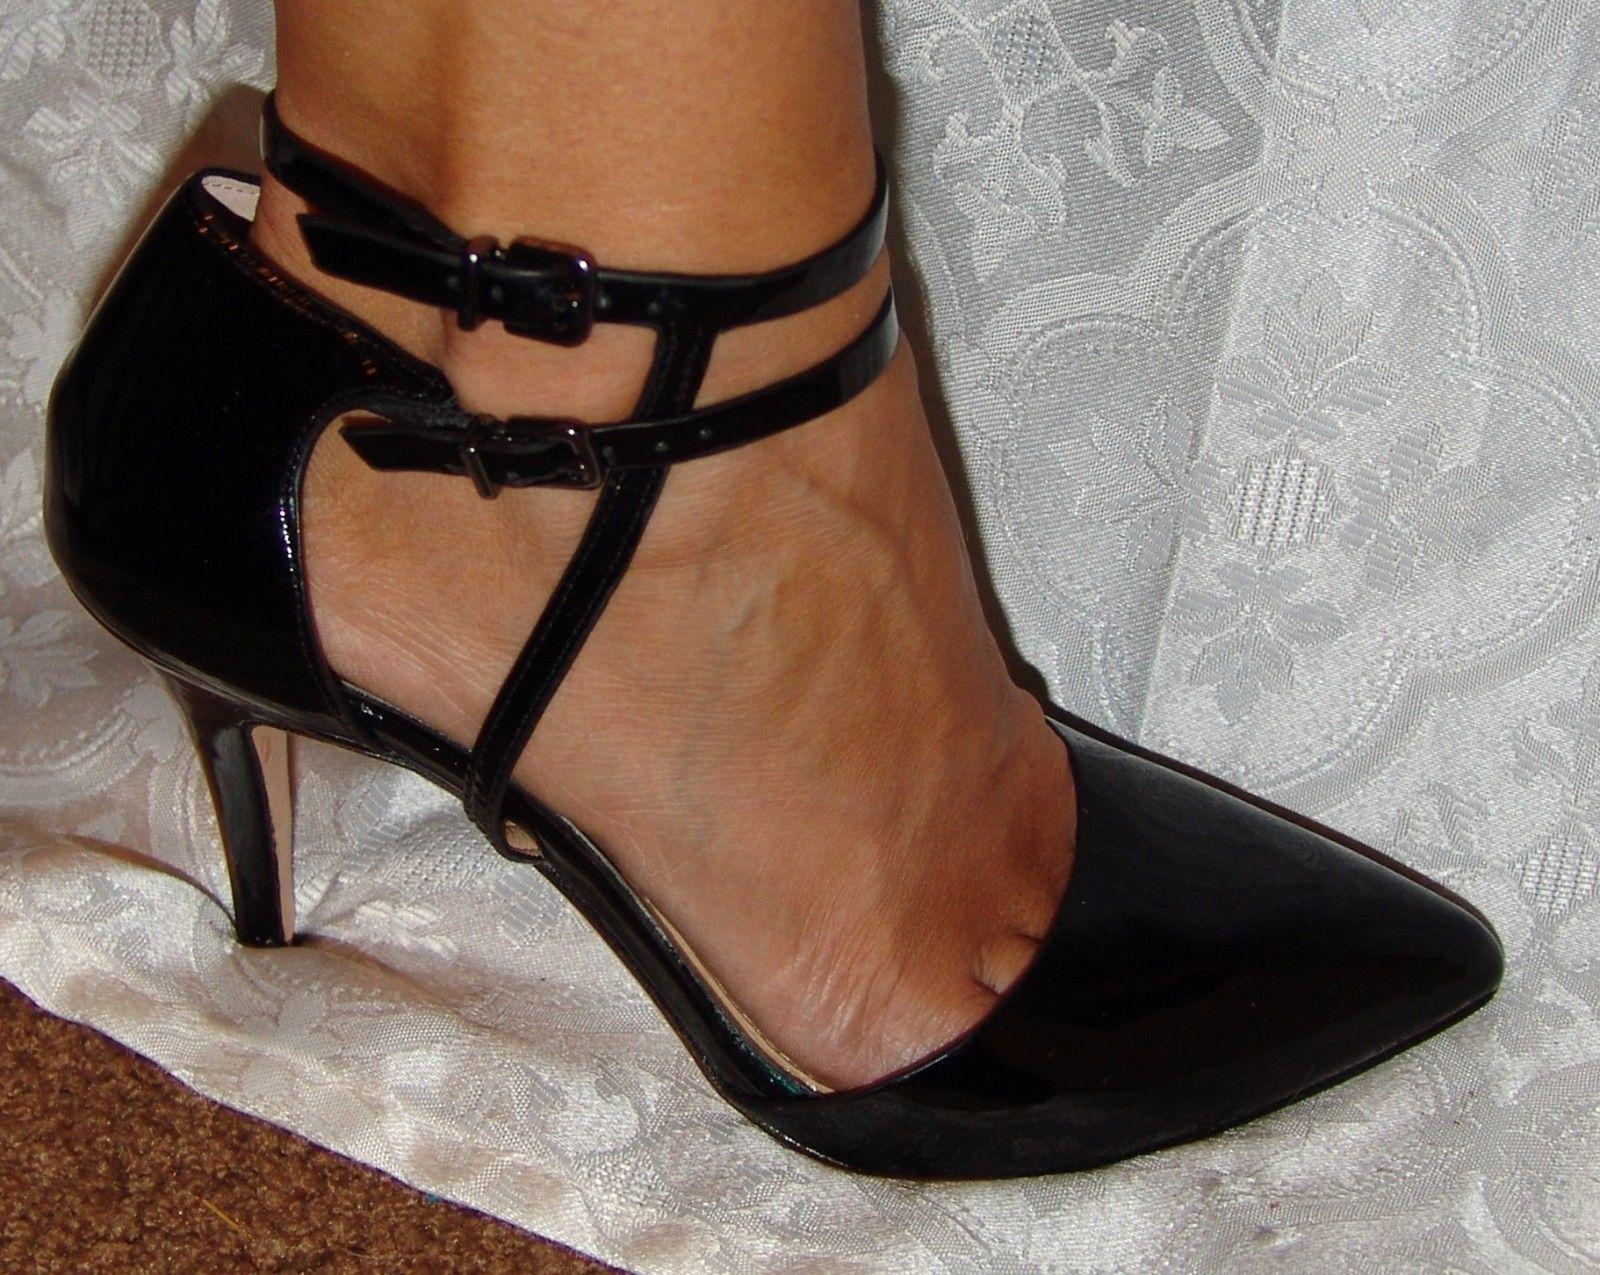 Antonio Melani Black Patent Leather Strappy Heels Pumps Womens 8.5 M Shoes 8 1/2